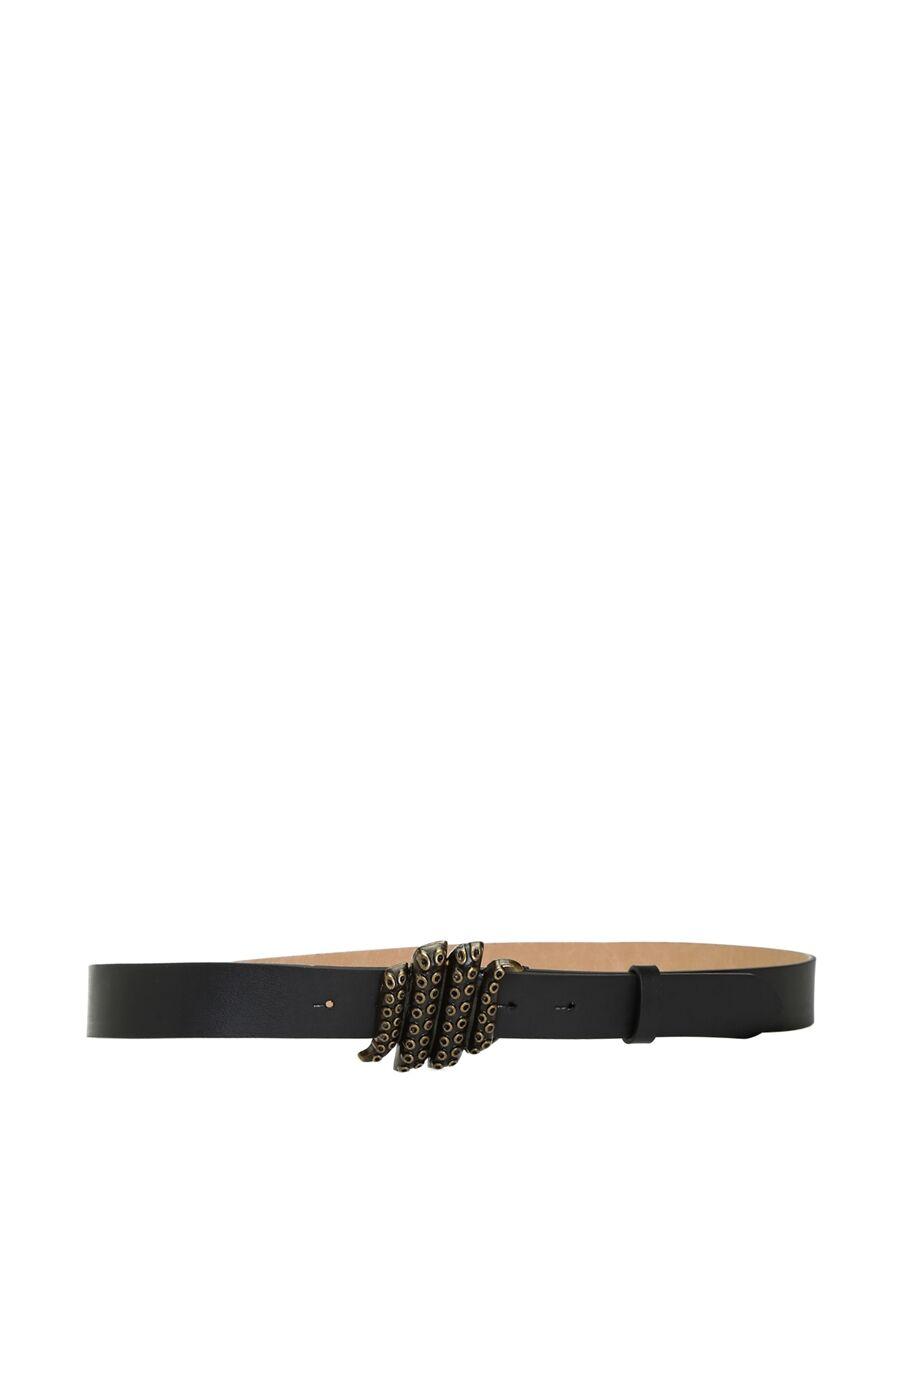 Ahtapot Tokalı Siyah Kadın Kemer